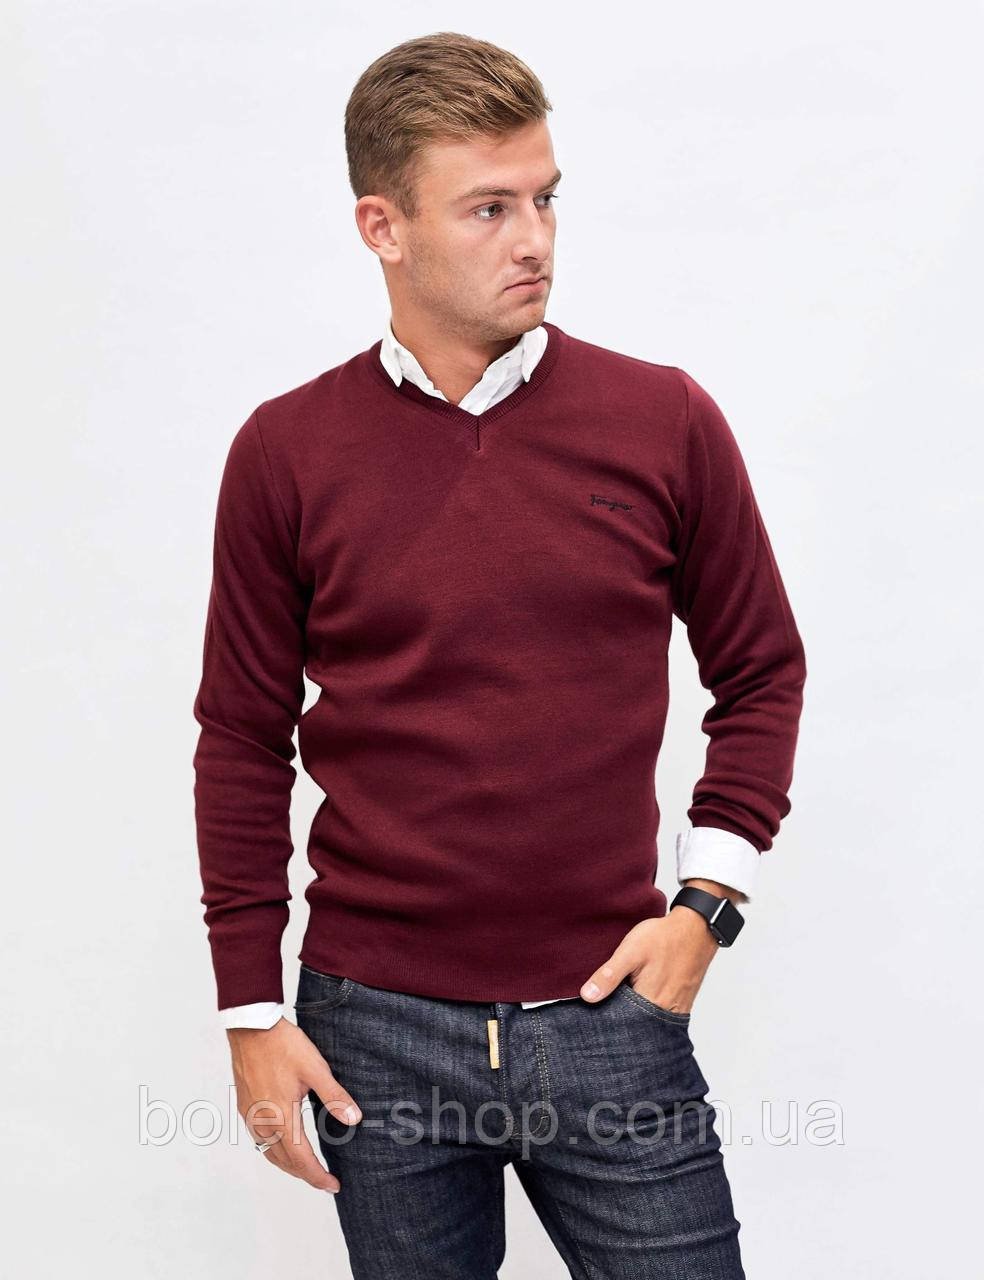 5905a3a0ab45e Мужской свитер пуловер Ferragamo в цветах : продажа, цена в Львове ...